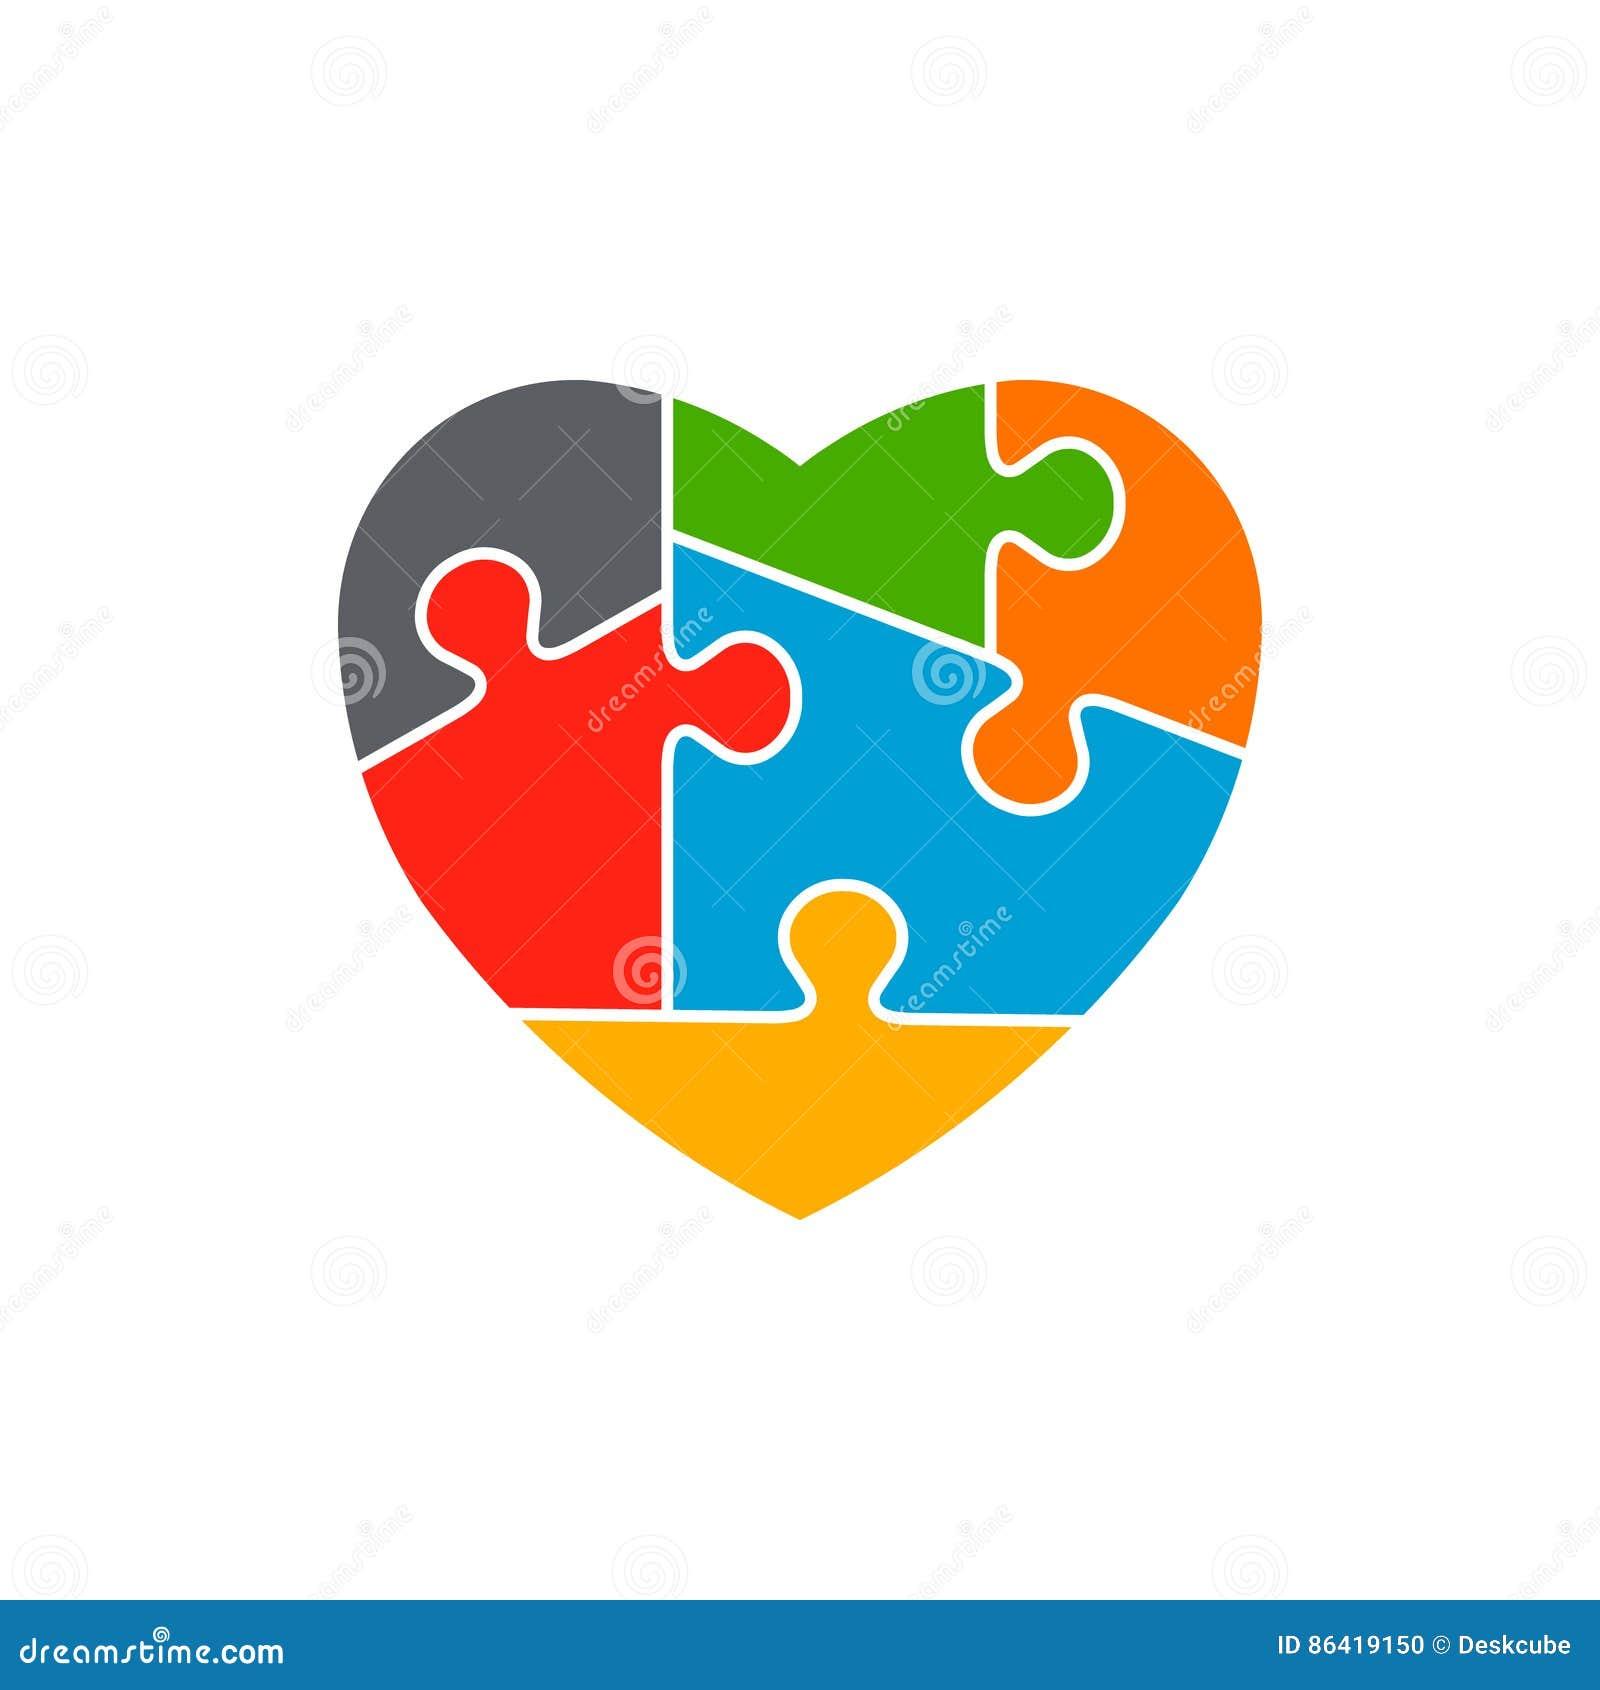 Heart autism awareness logo design stock vector illustration of heart autism awareness logo design biocorpaavc Gallery